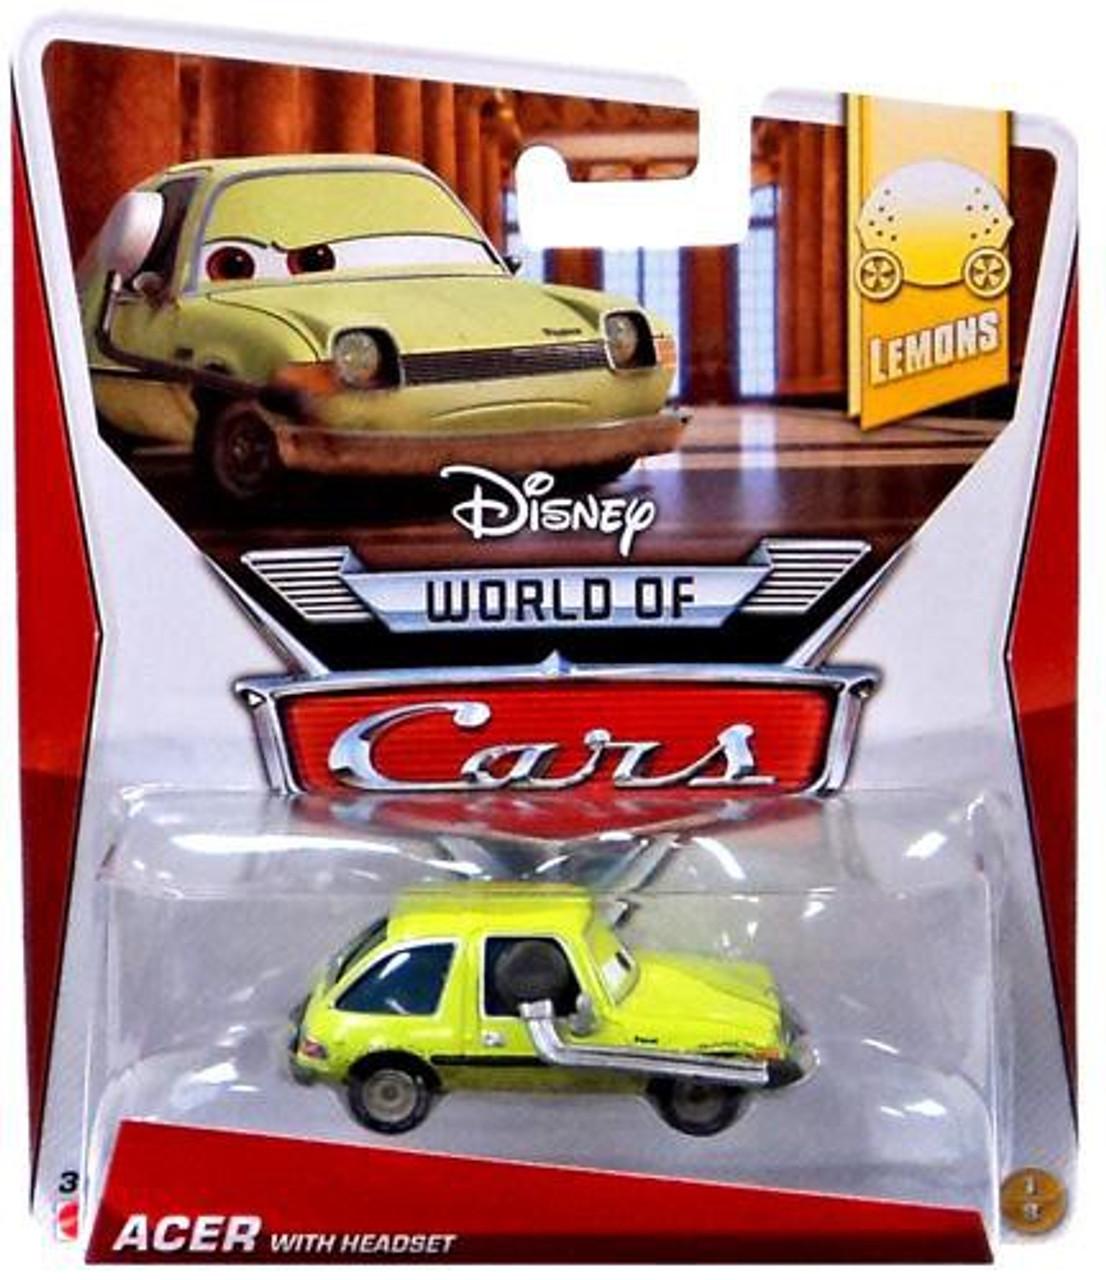 Disney Cars The World of Cars Lemons Acer with Headset Diecast Car #1/8